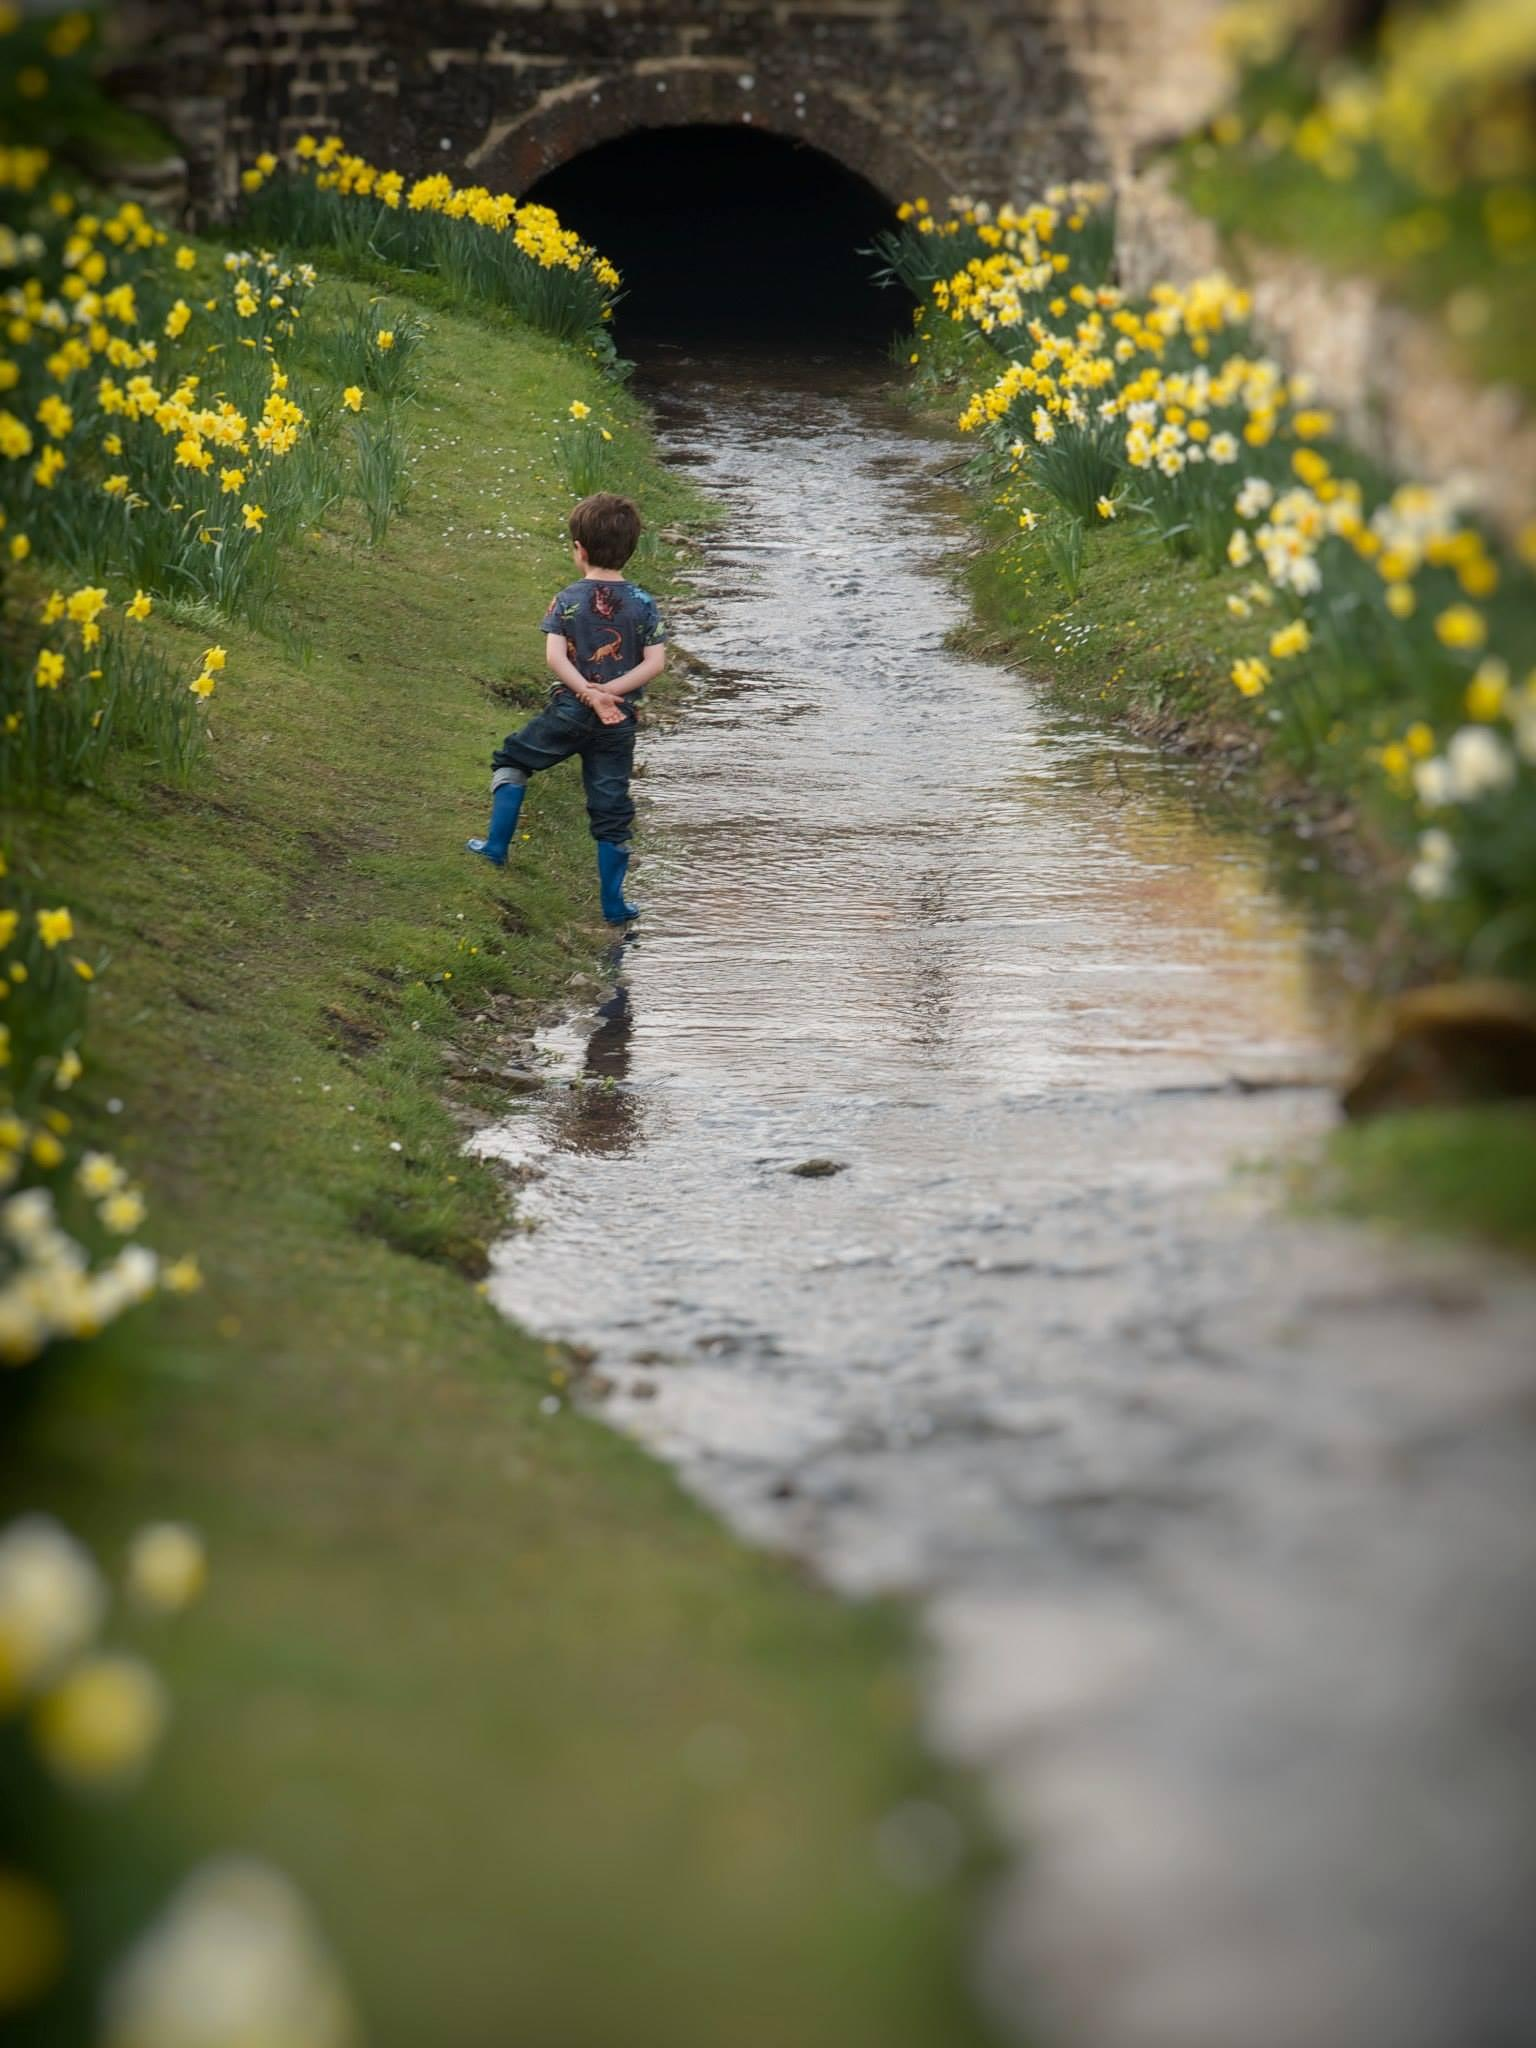 Boy in stream by Jacqui Adams